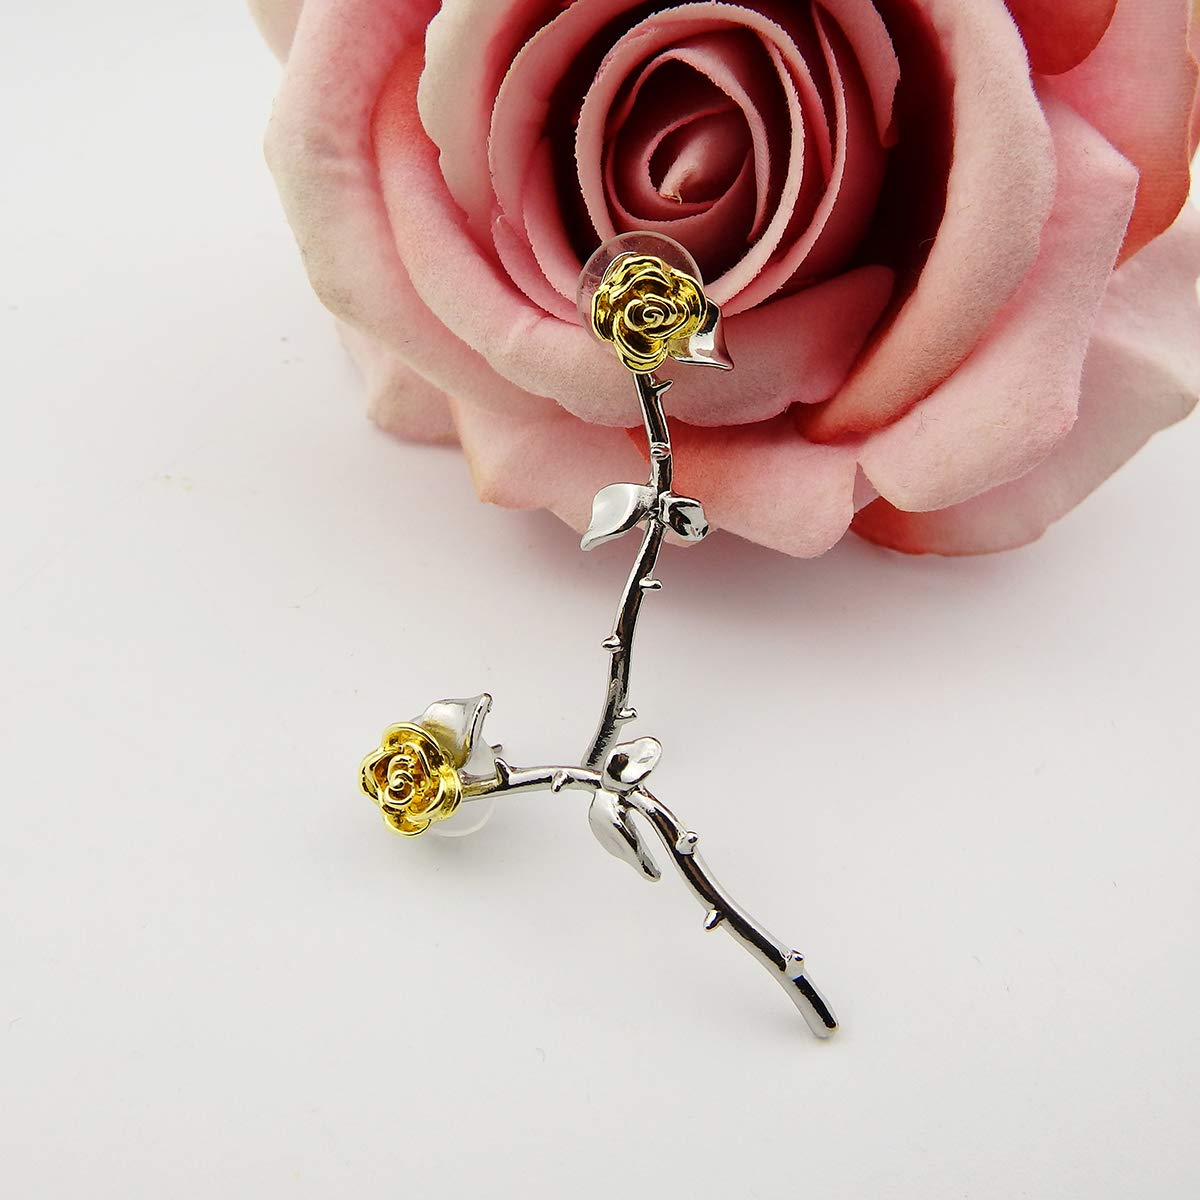 Silver Plated Romantic Rose Flower Two Tone Stud Dangle Earrings Women Girls Gift for Her